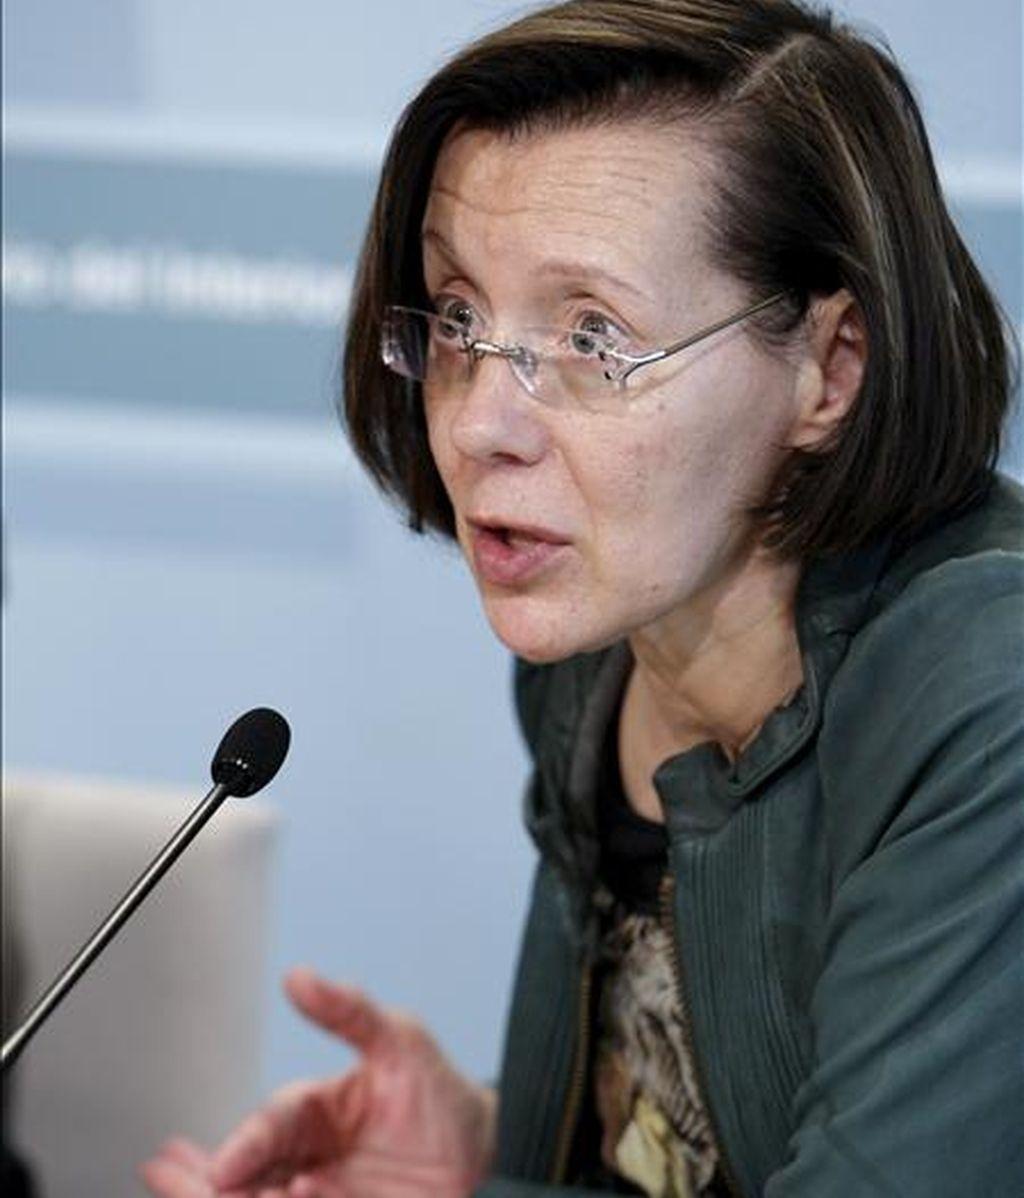 La consejera de Justicia de la Generalitat de Cataluña, Montserrat Tura. EFE/Archivo